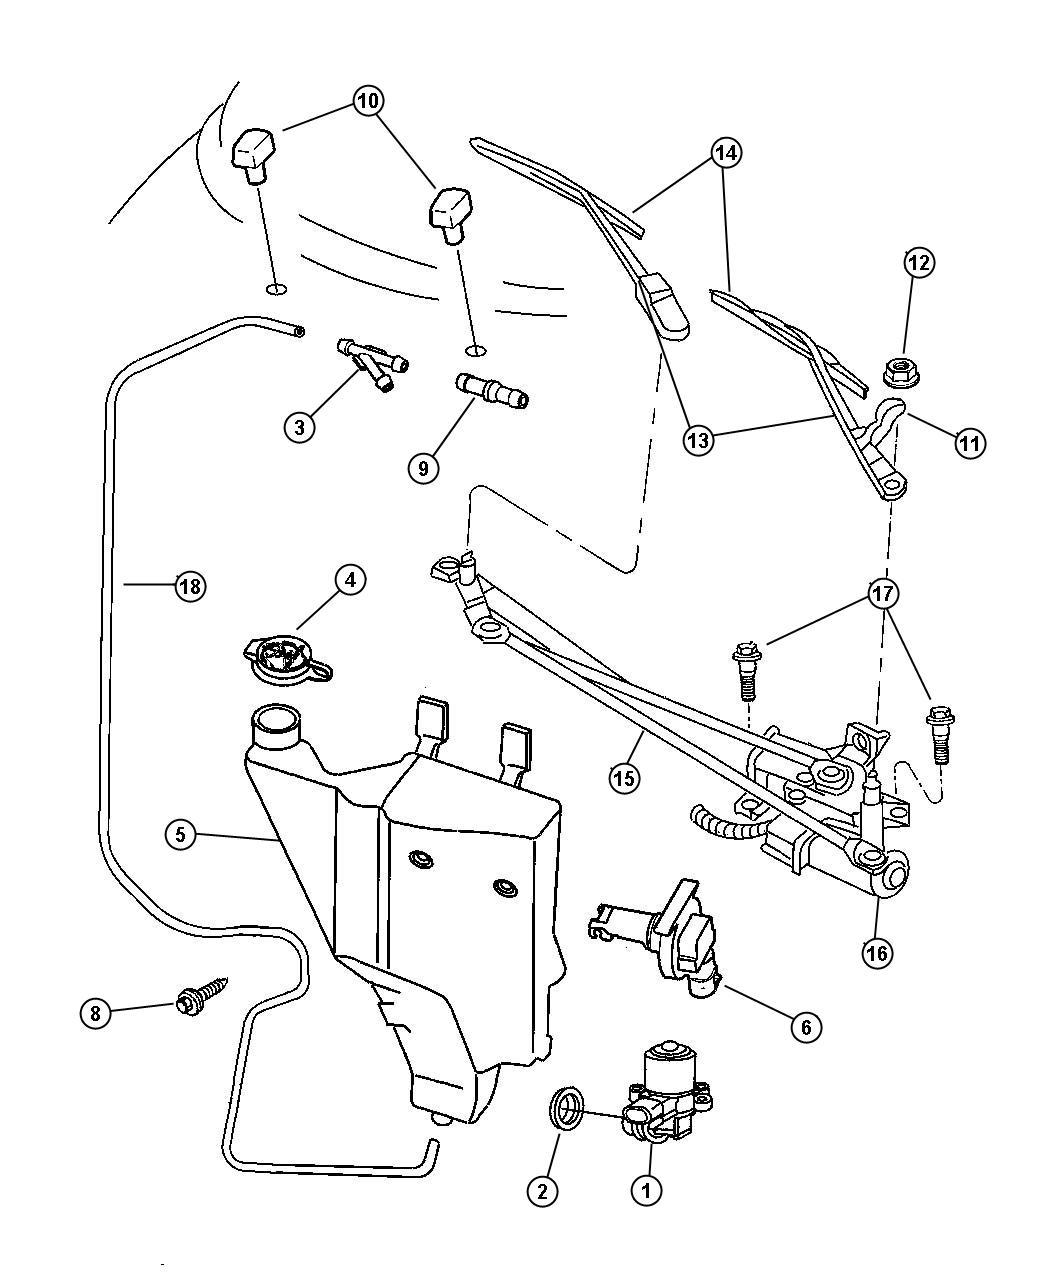 Chrysler Sebring Windshield Wiper And Washer System